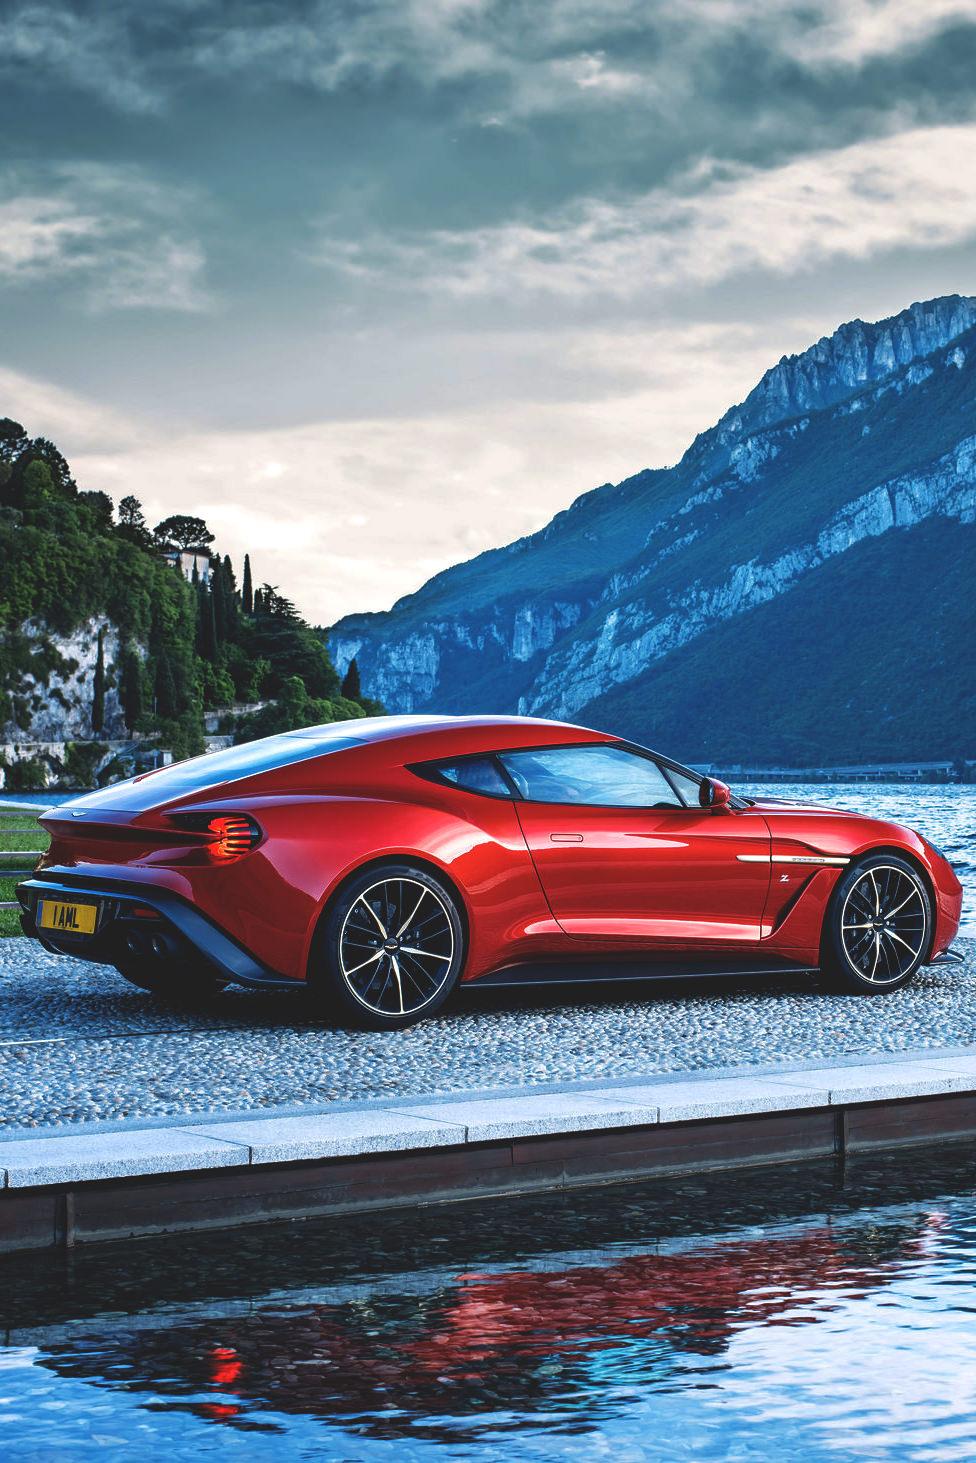 zagato aston martin vanquish sportscar vehicle travel water fast road outdoors landscape